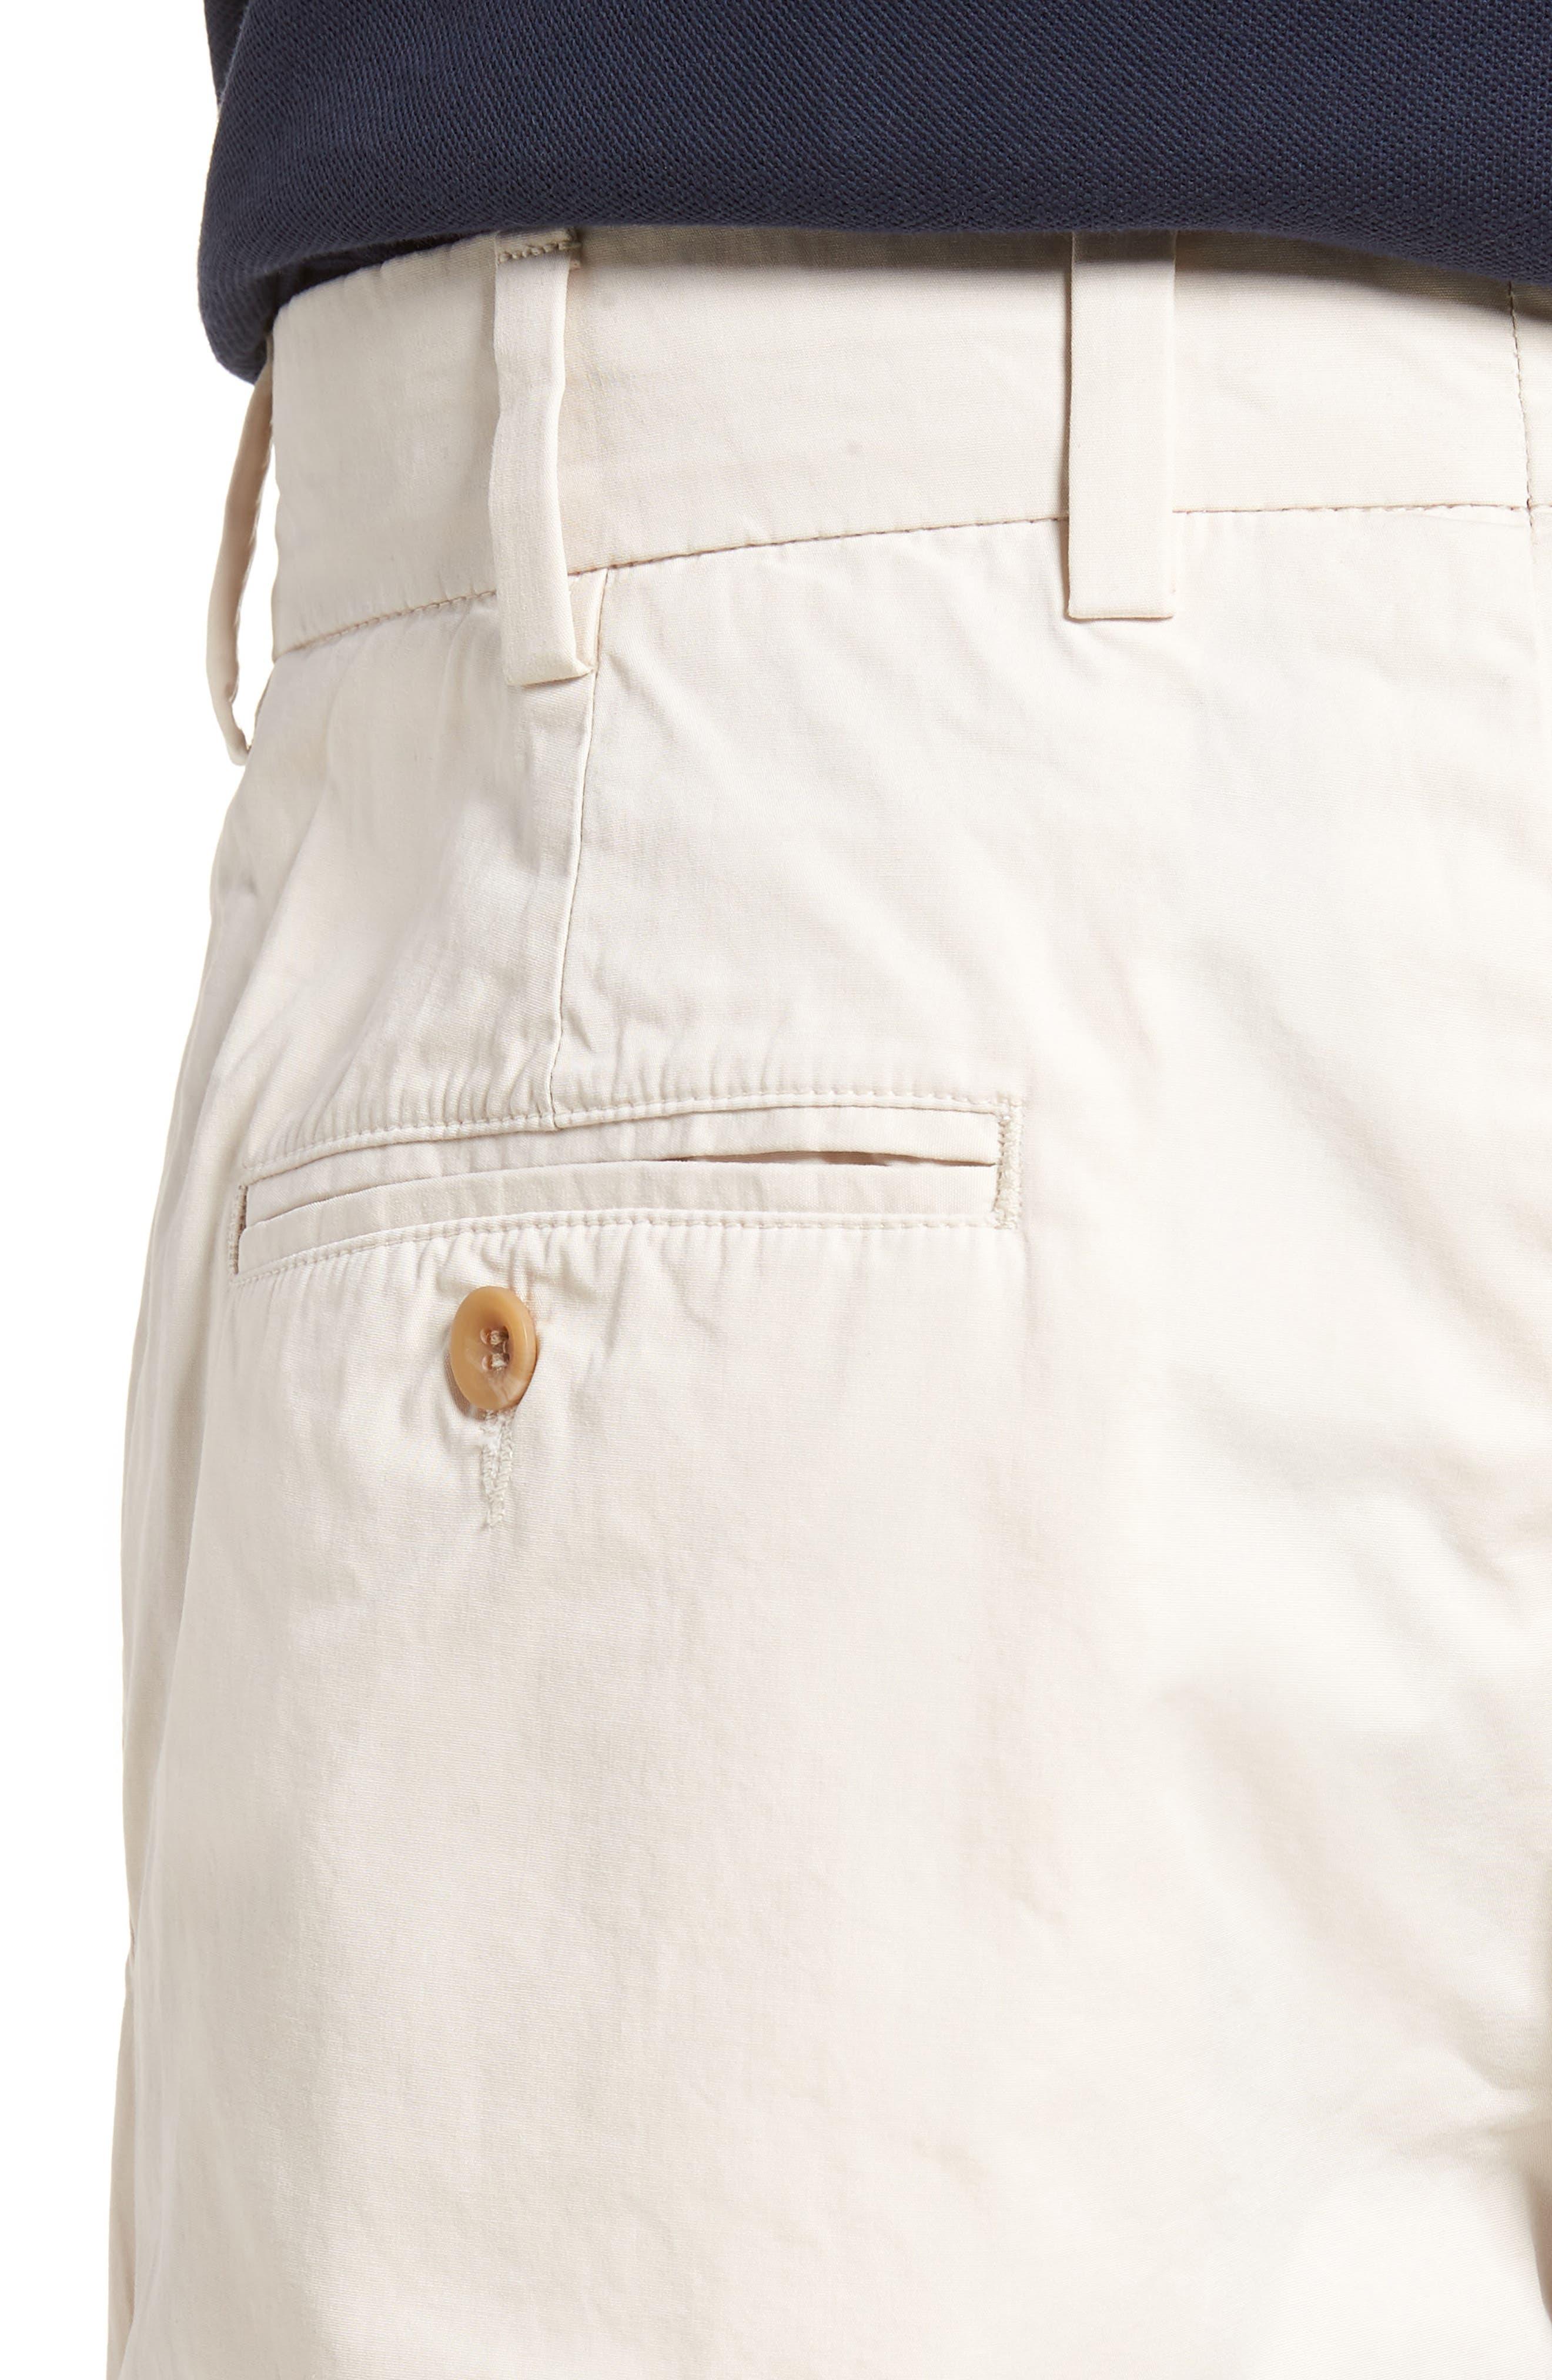 M3 Straight Fit Flat Front Tropical Poplin Pants,                             Alternate thumbnail 4, color,                             Sand